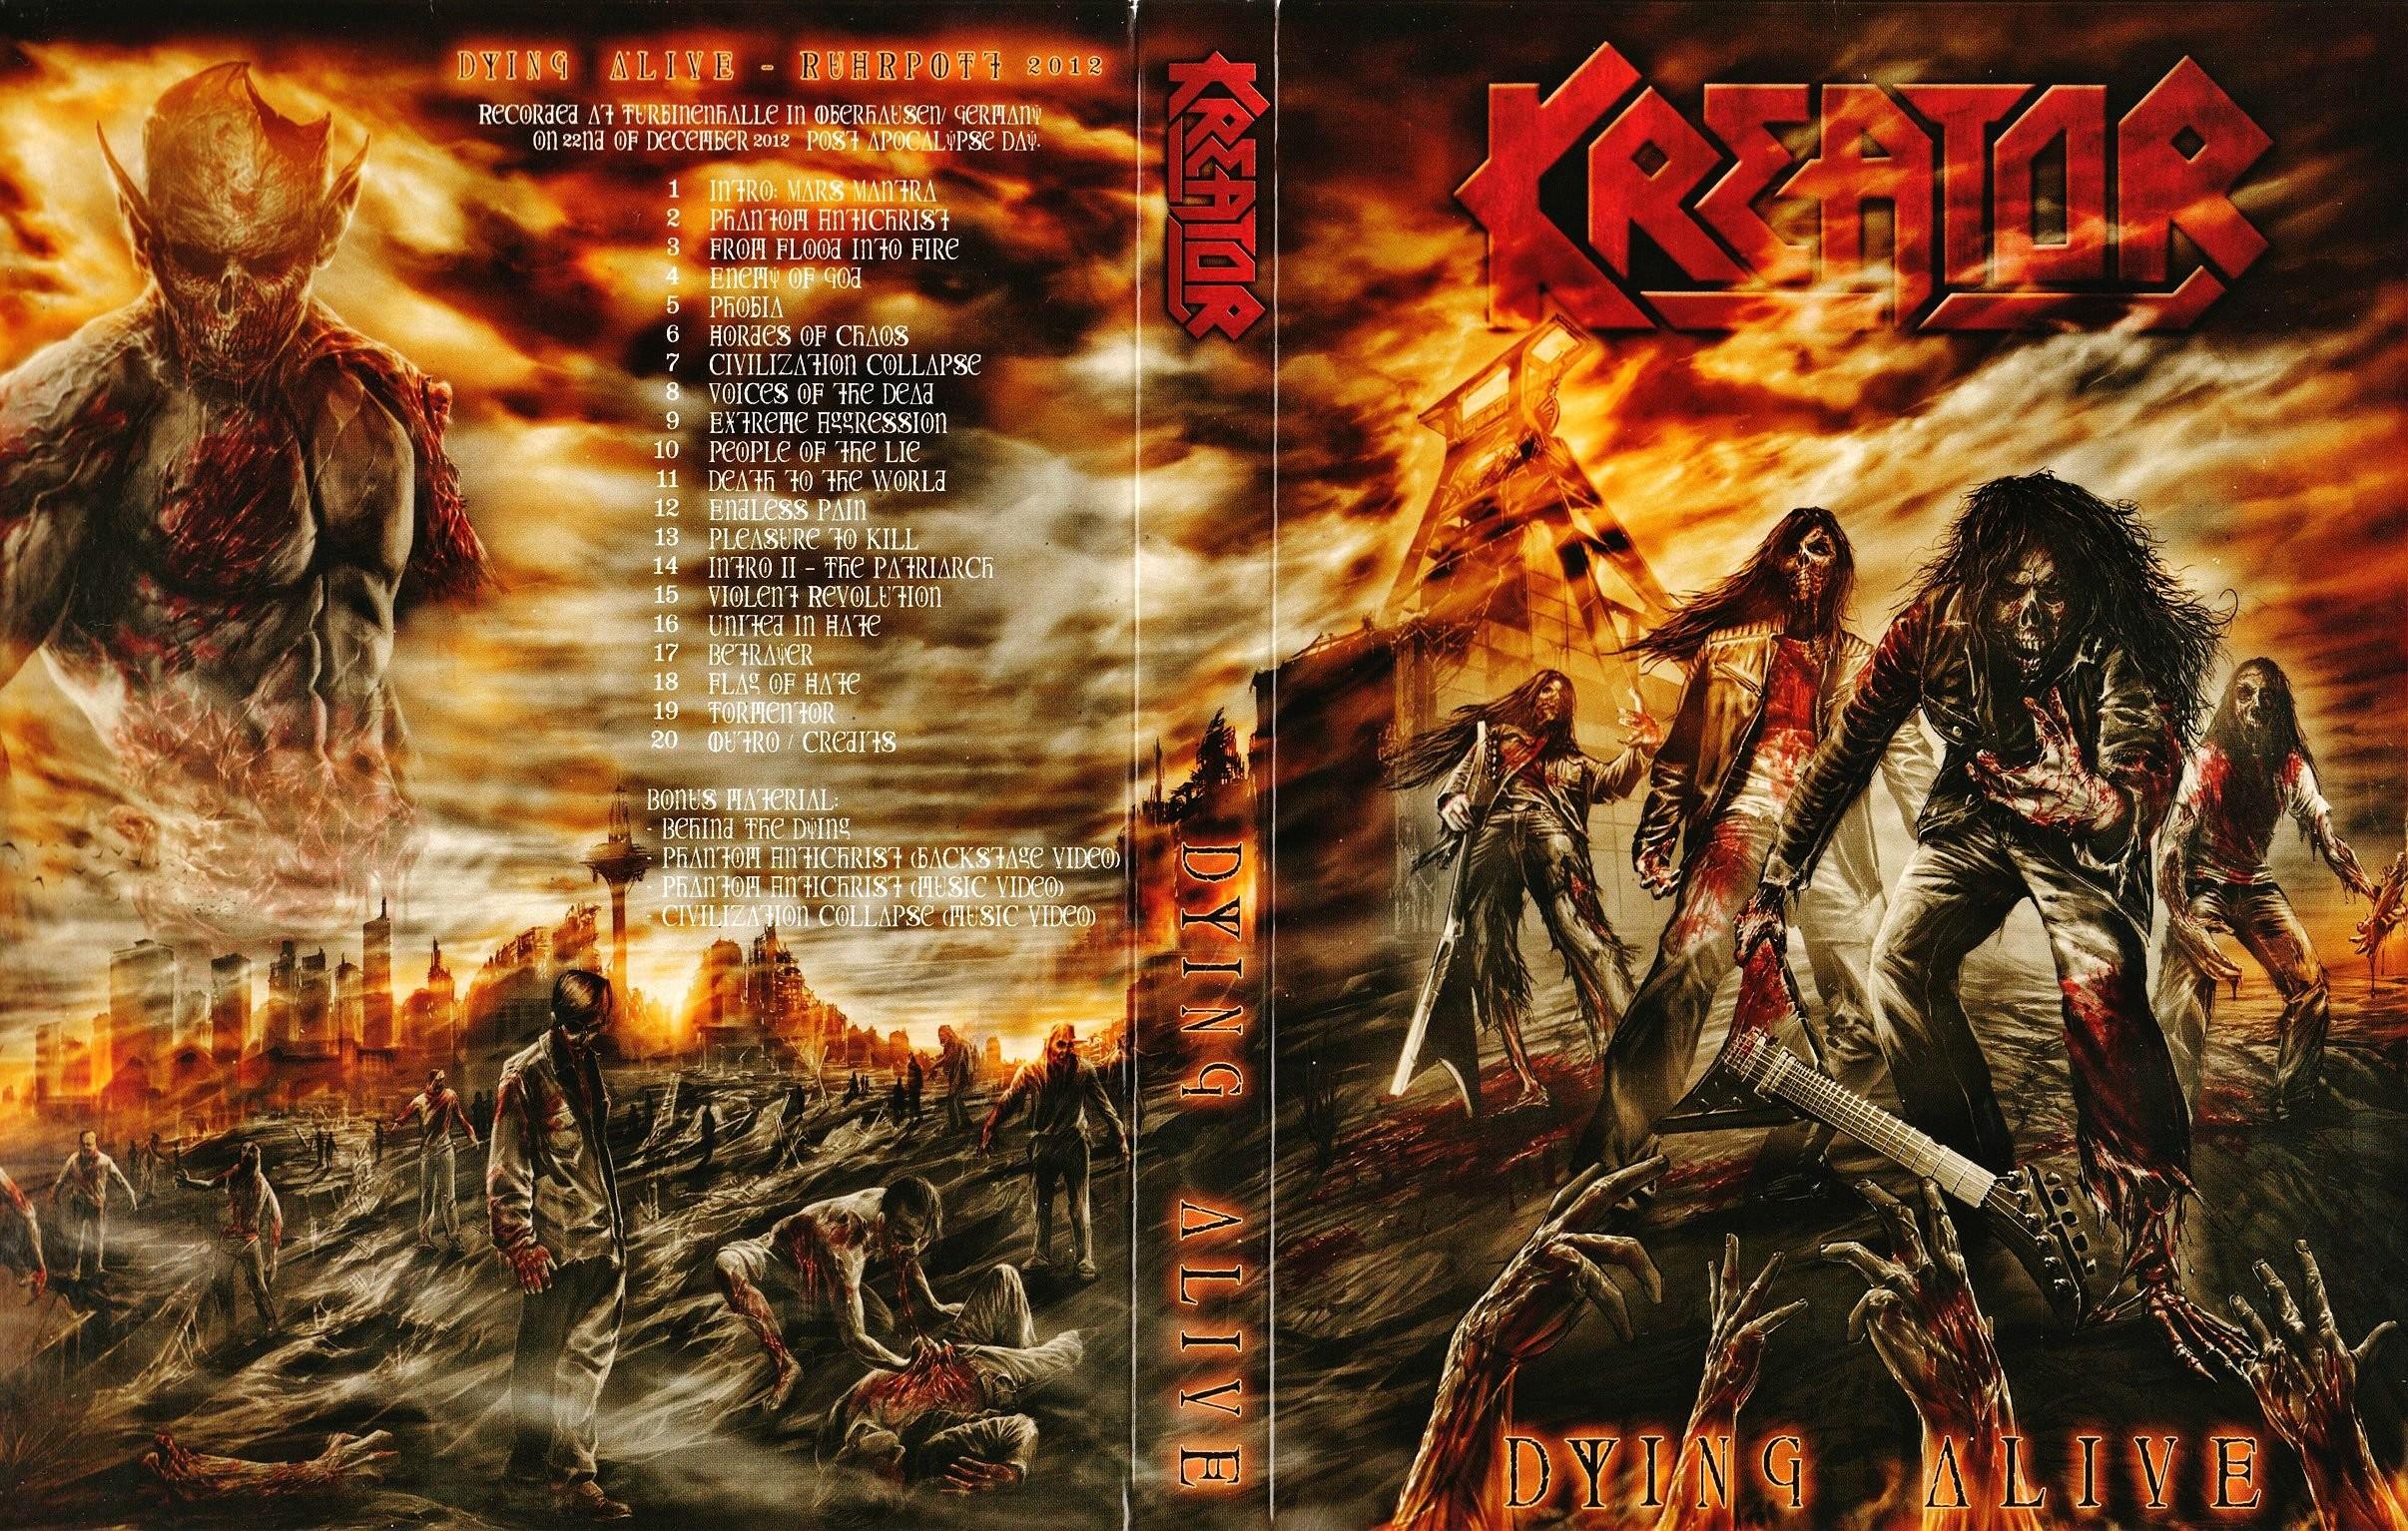 Res: 2412x1534, kreator, Thrash, Metal, Heavy, Rock, Dark, Evil, Poster Wallpapers HD /  Desktop and Mobile Backgrounds